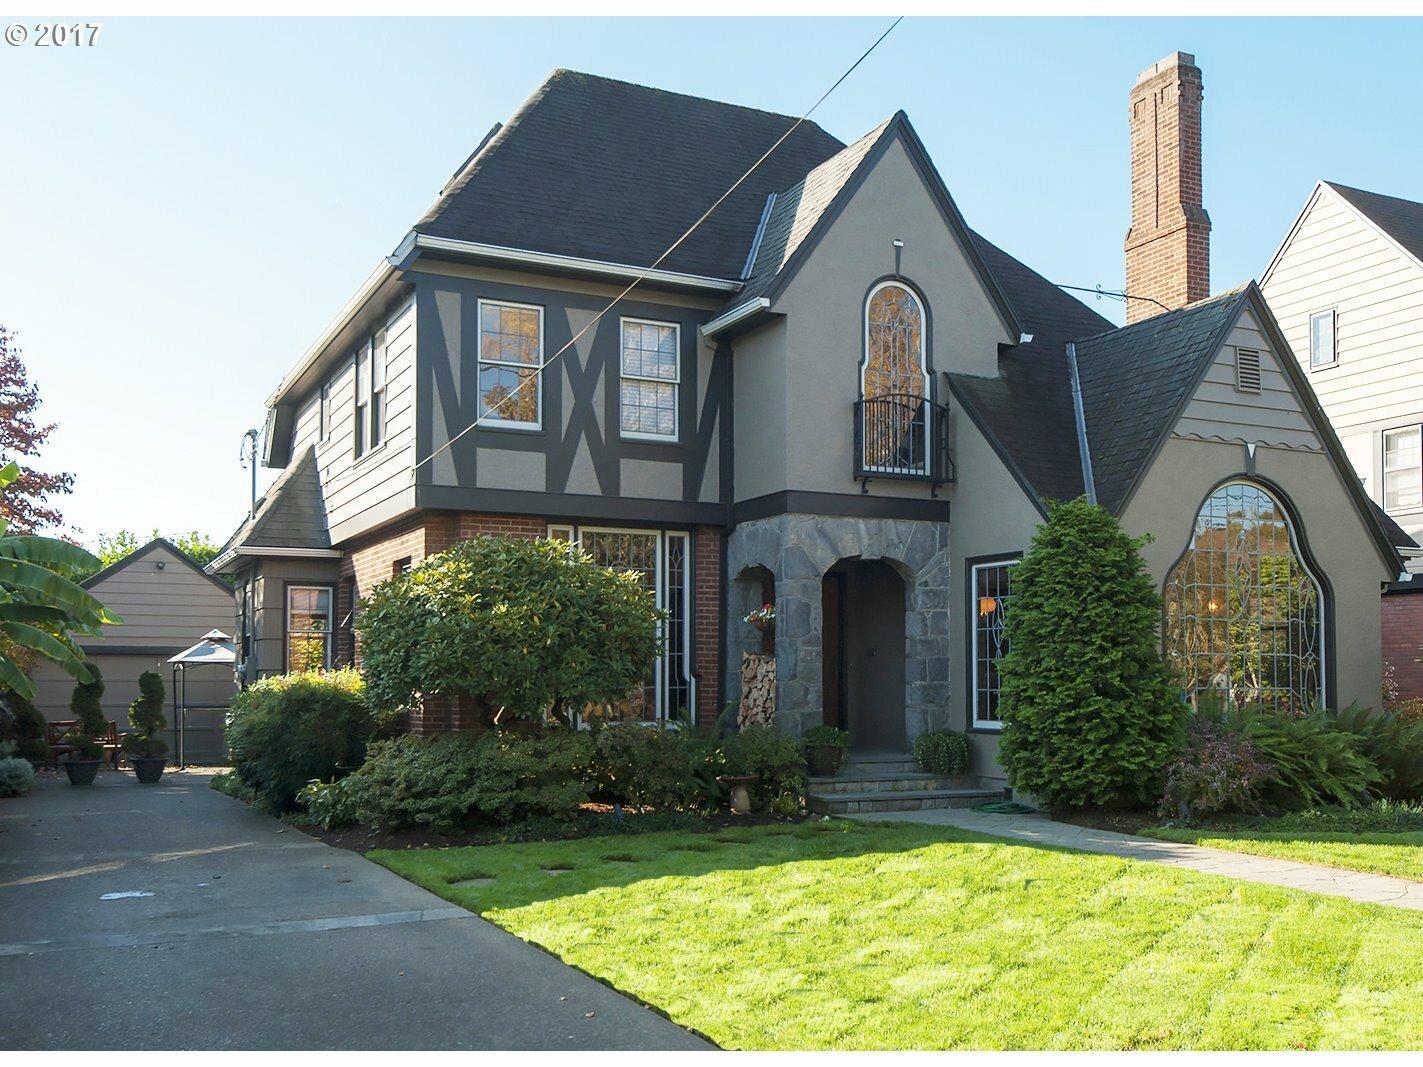 3236 Ne Us Grant Pl, Portland, OR - USA (photo 1)